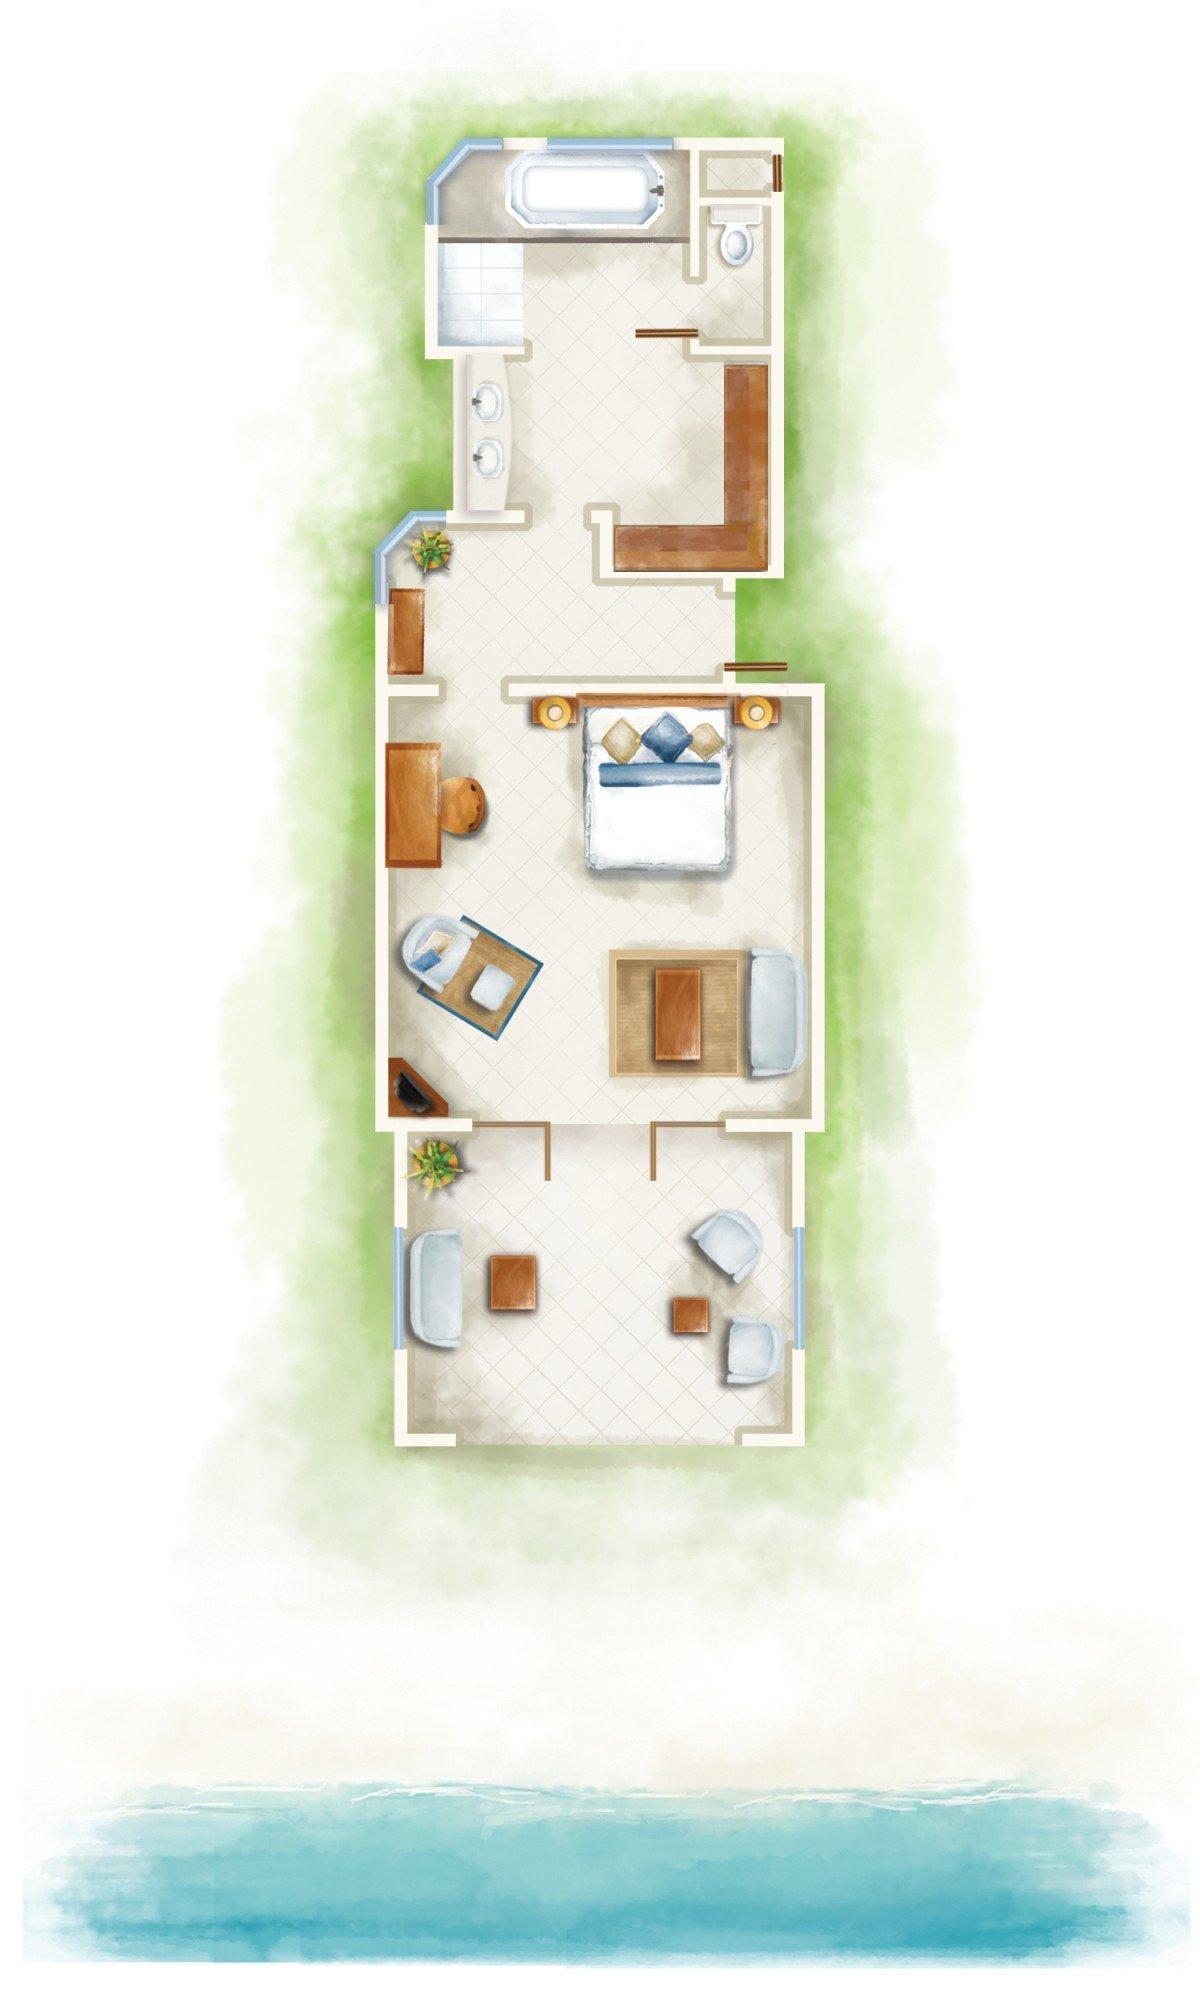 Tropical Room (76 m²)